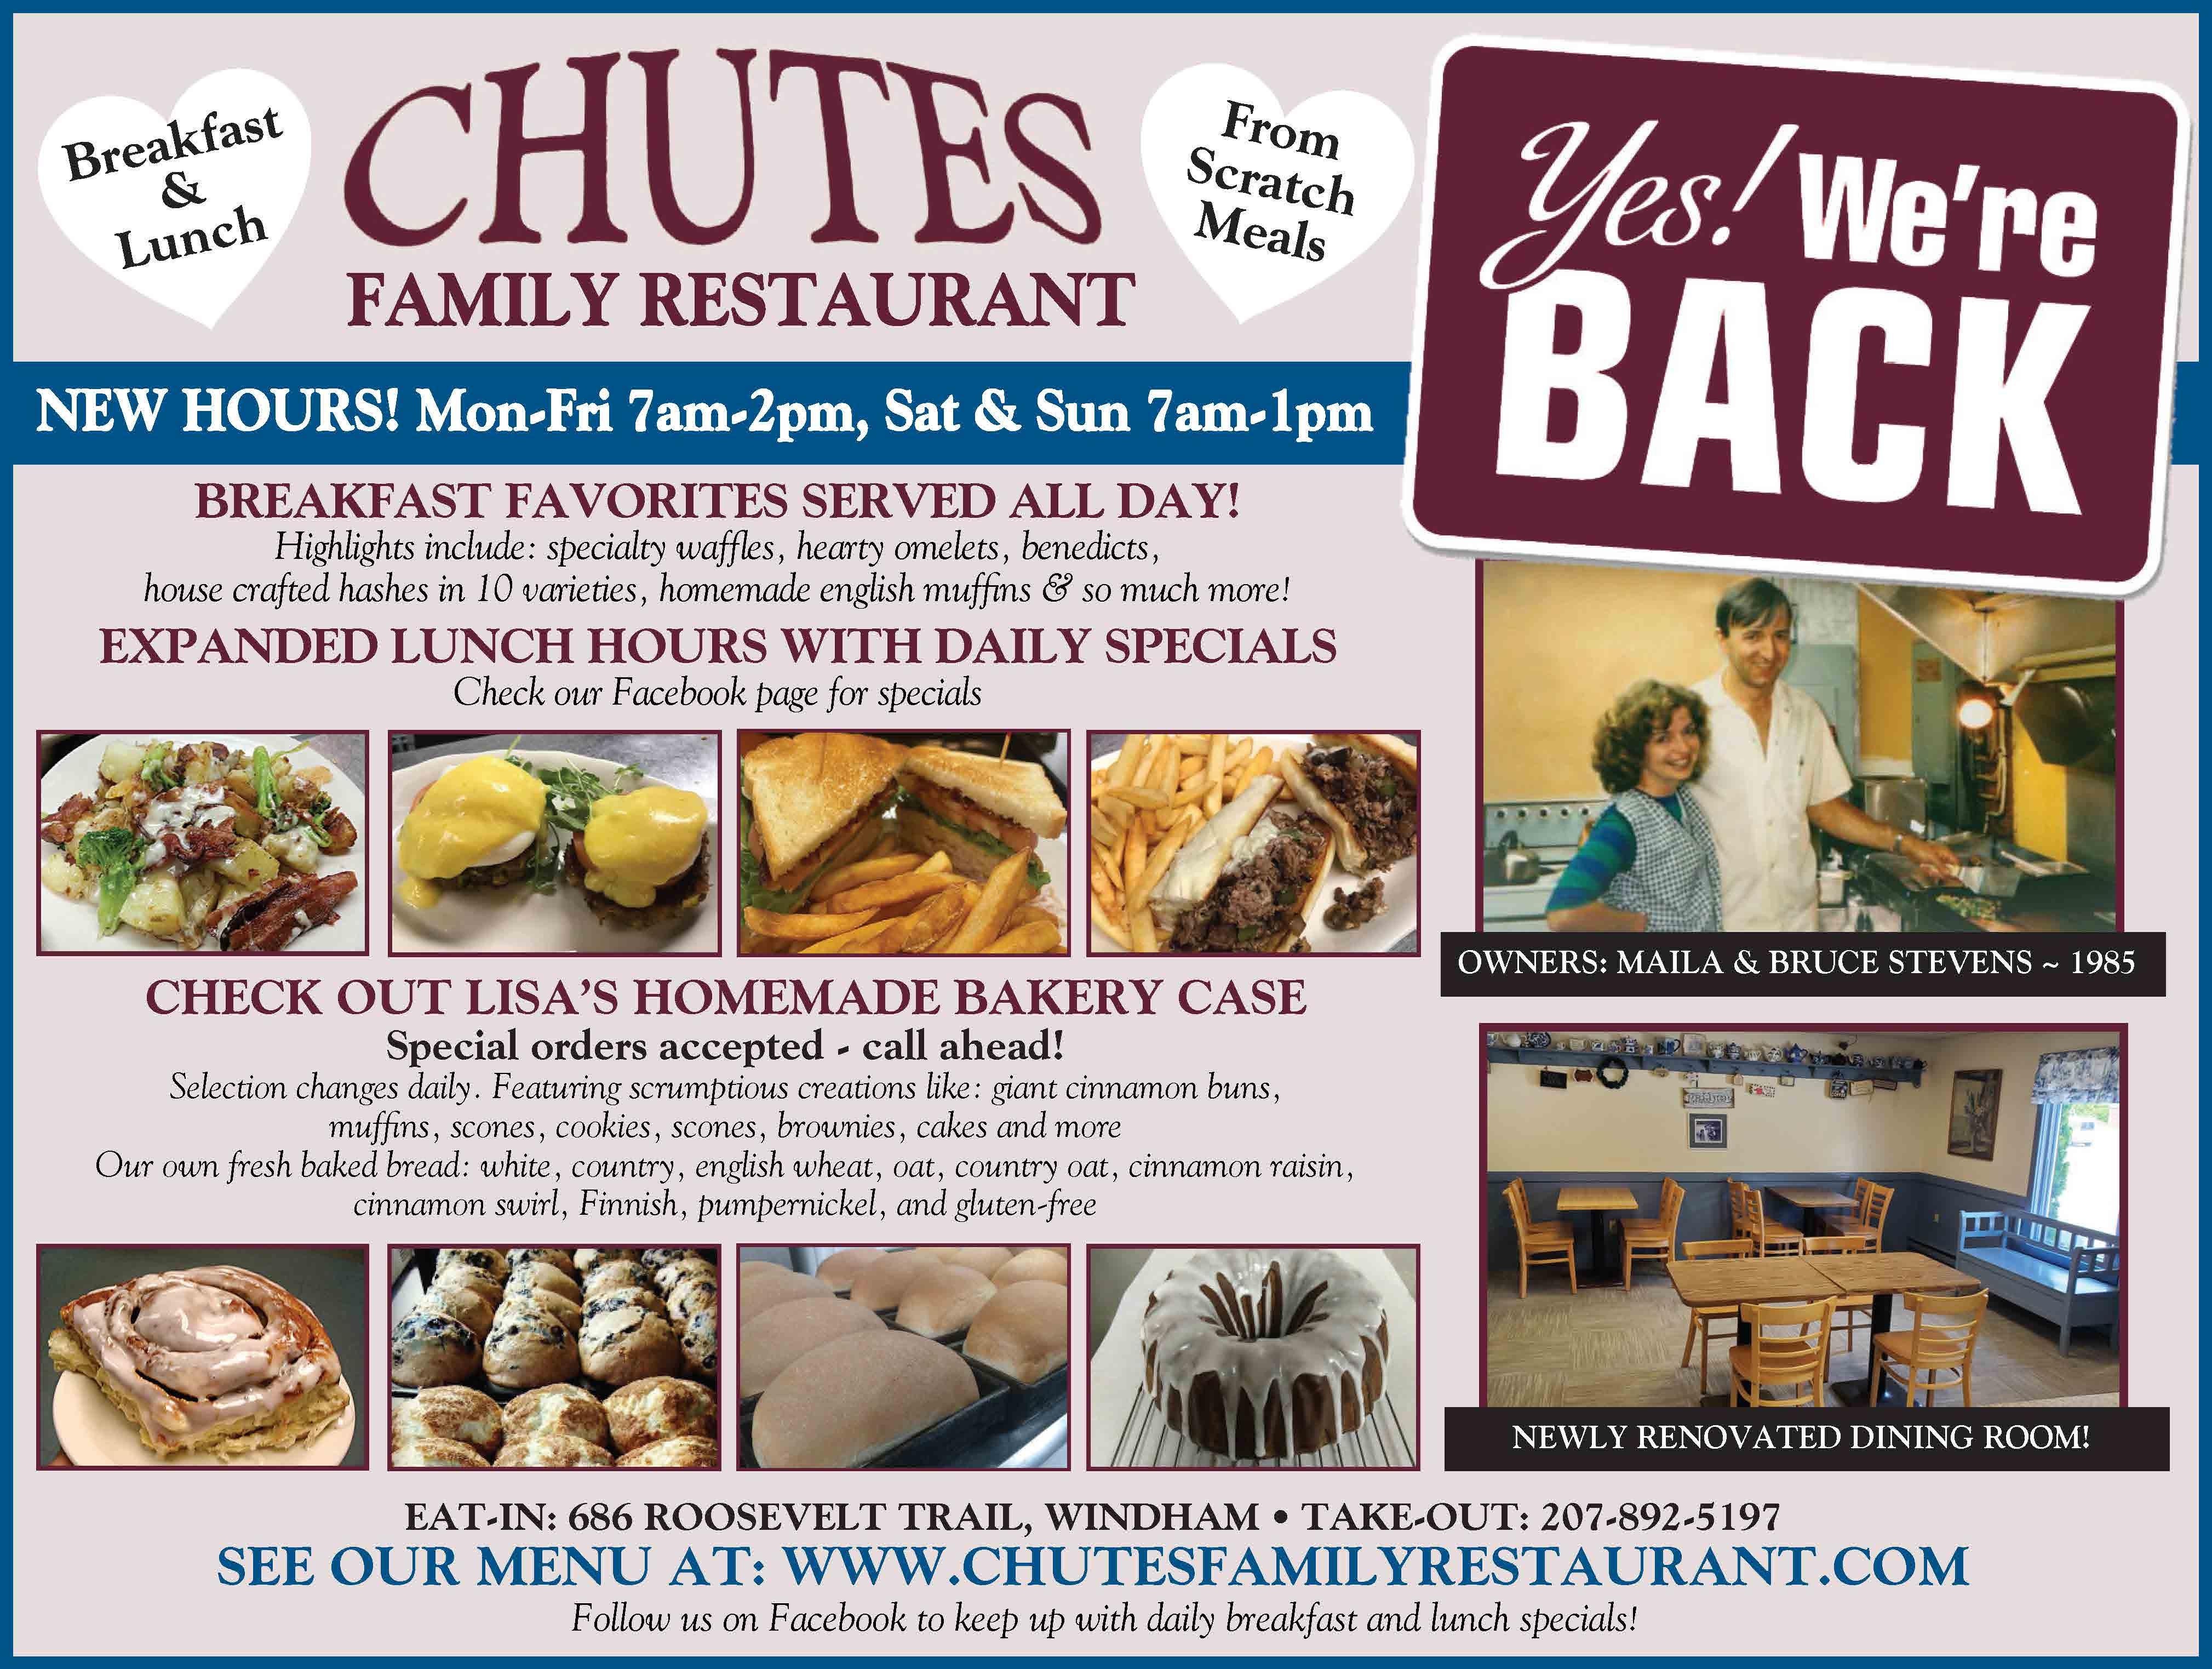 http://chutesfamilyrestaurant.com/